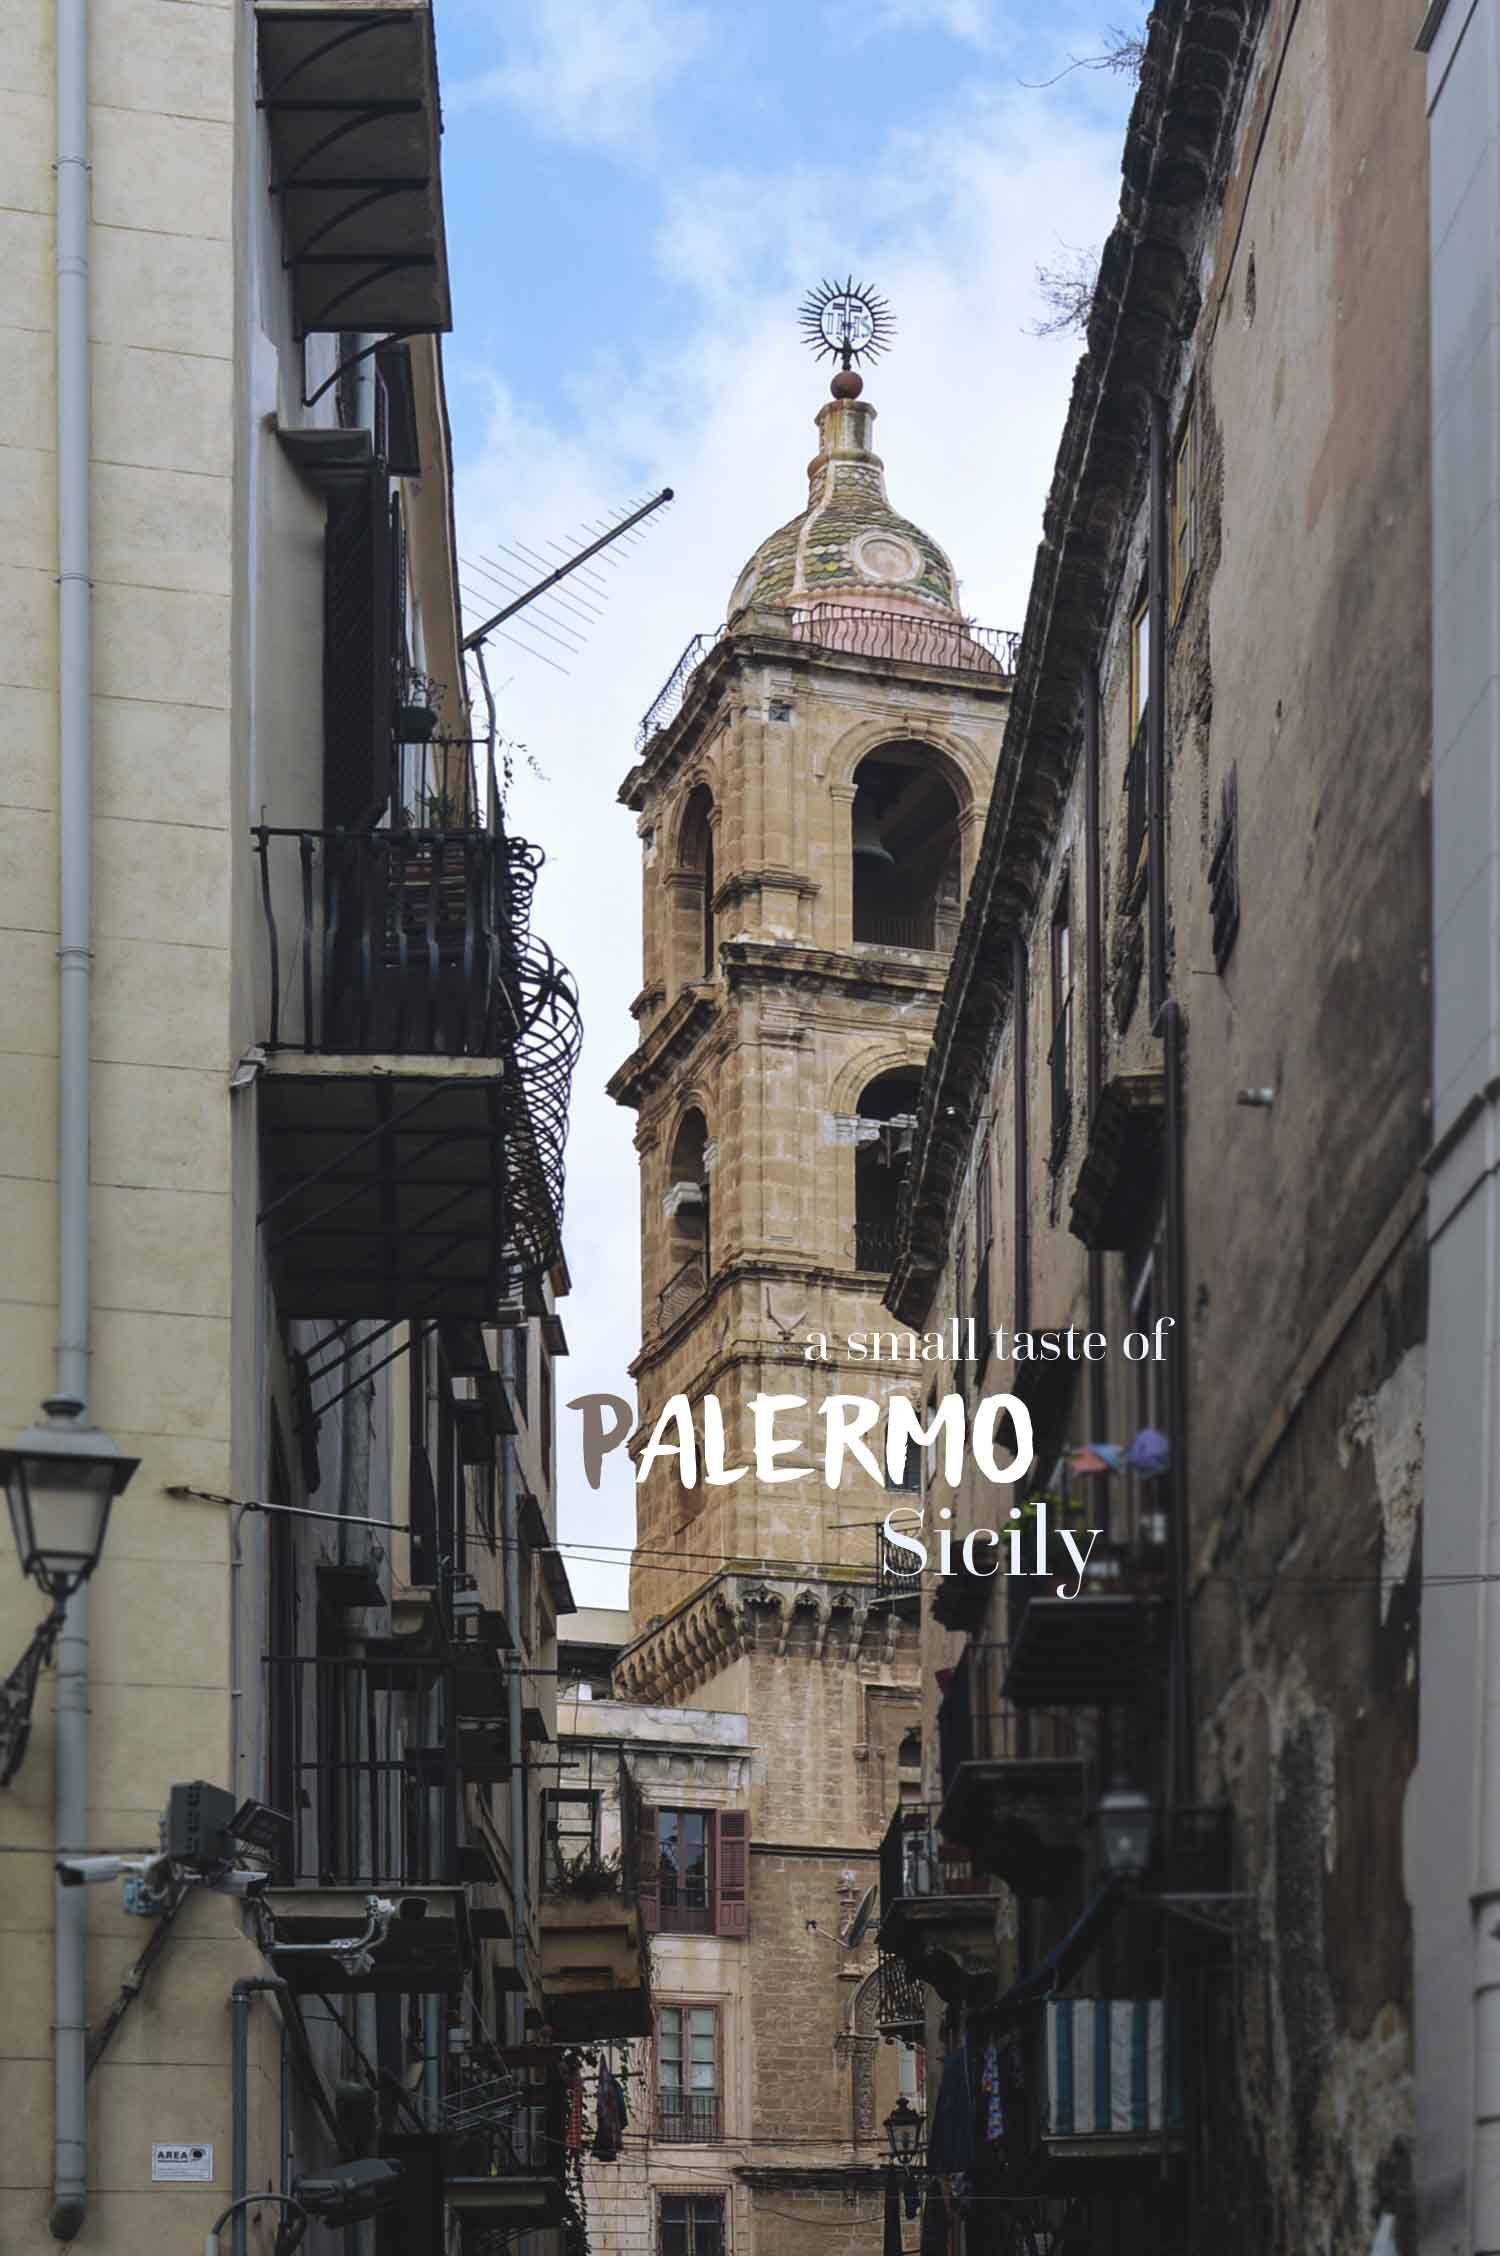 Italy Palermo, Sicily Palermo sicily, Sicily, Palermo